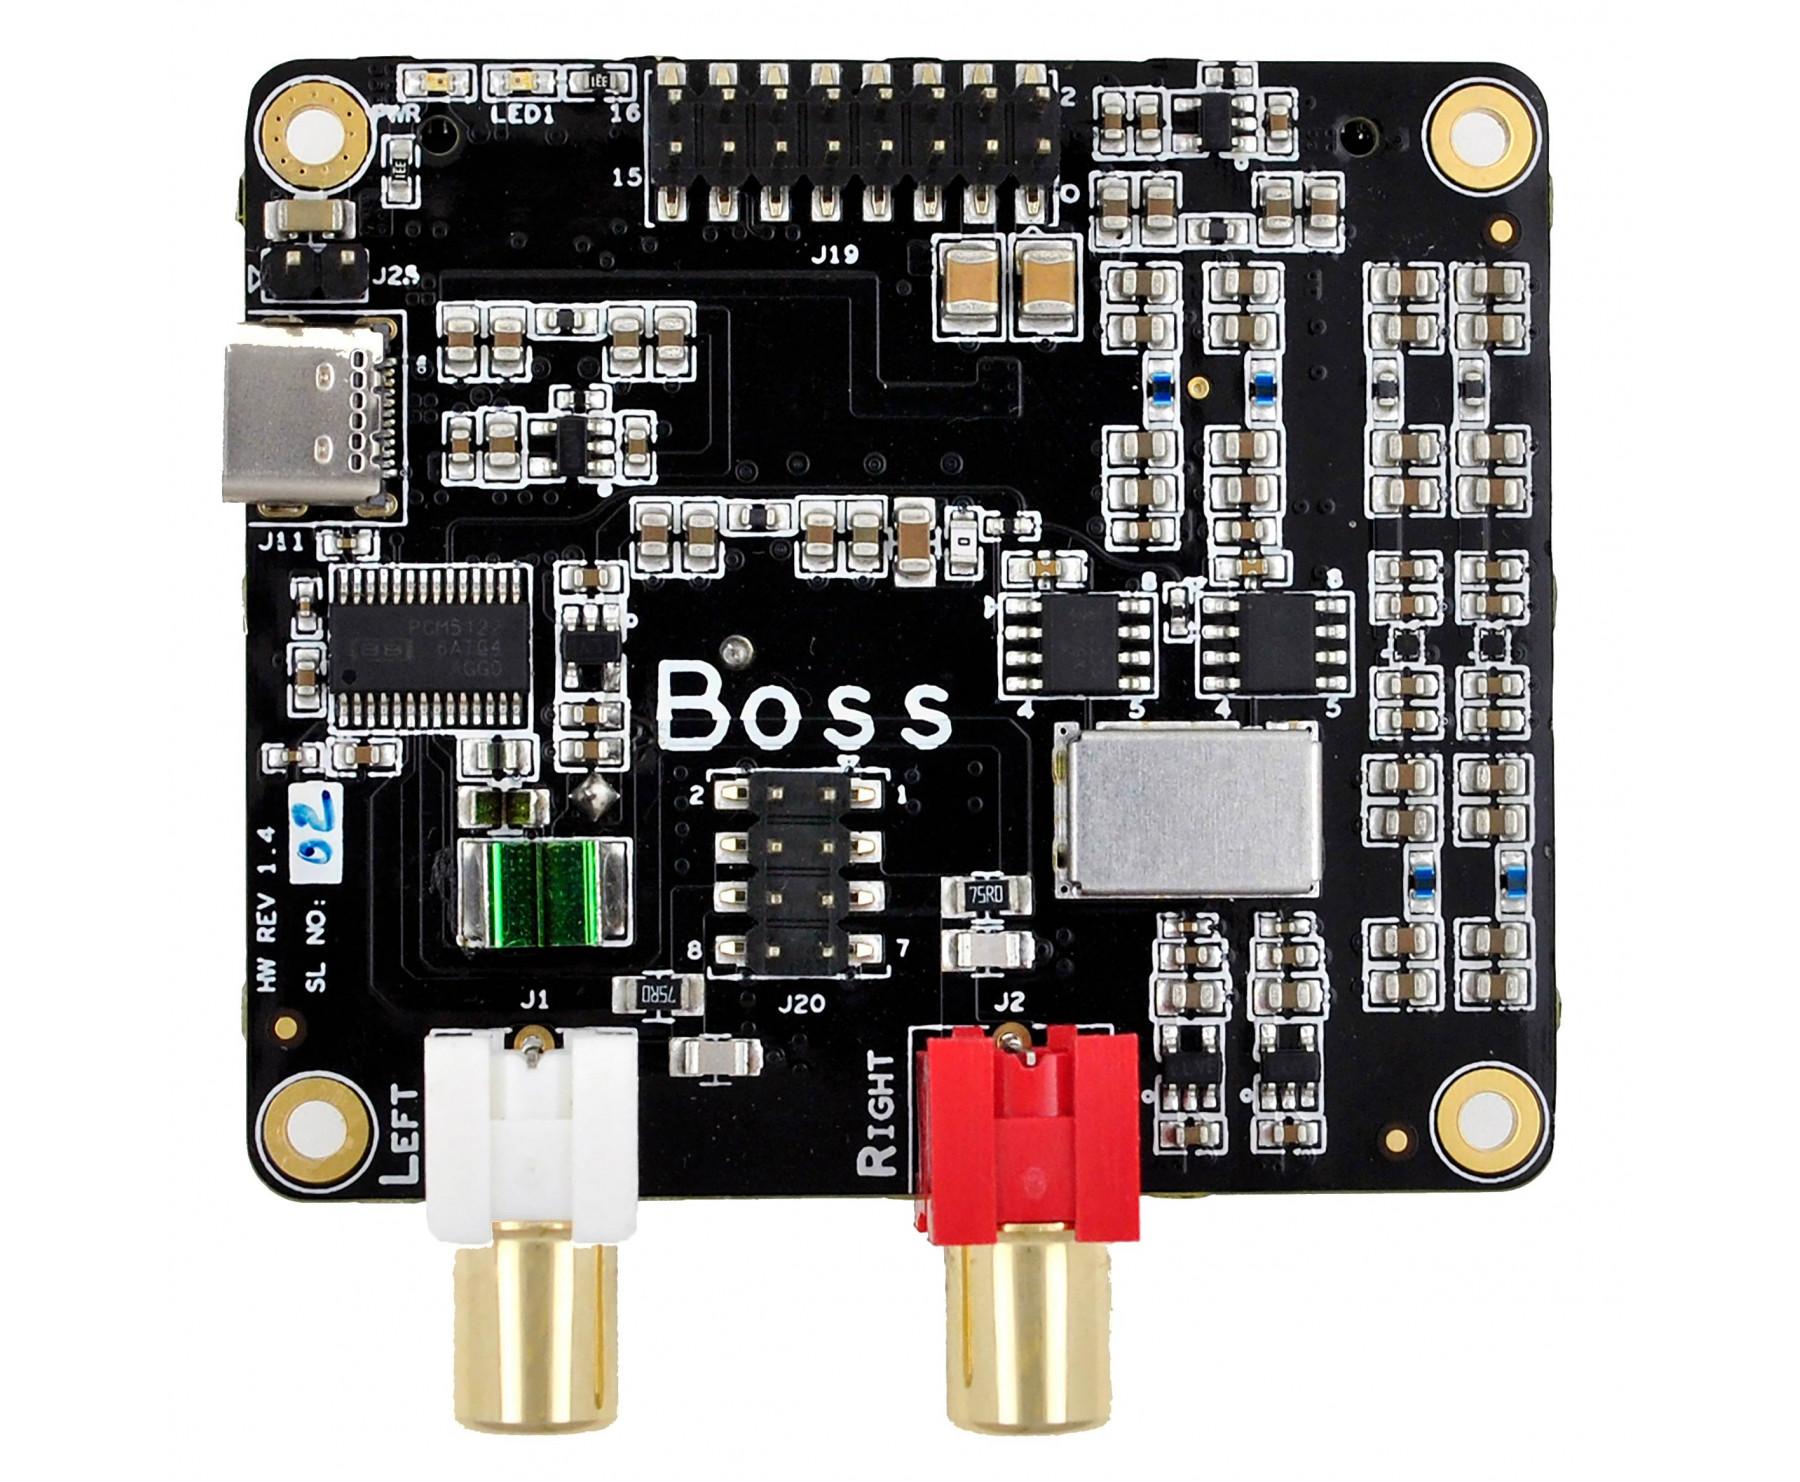 BOSS 1 2 Player, network music player